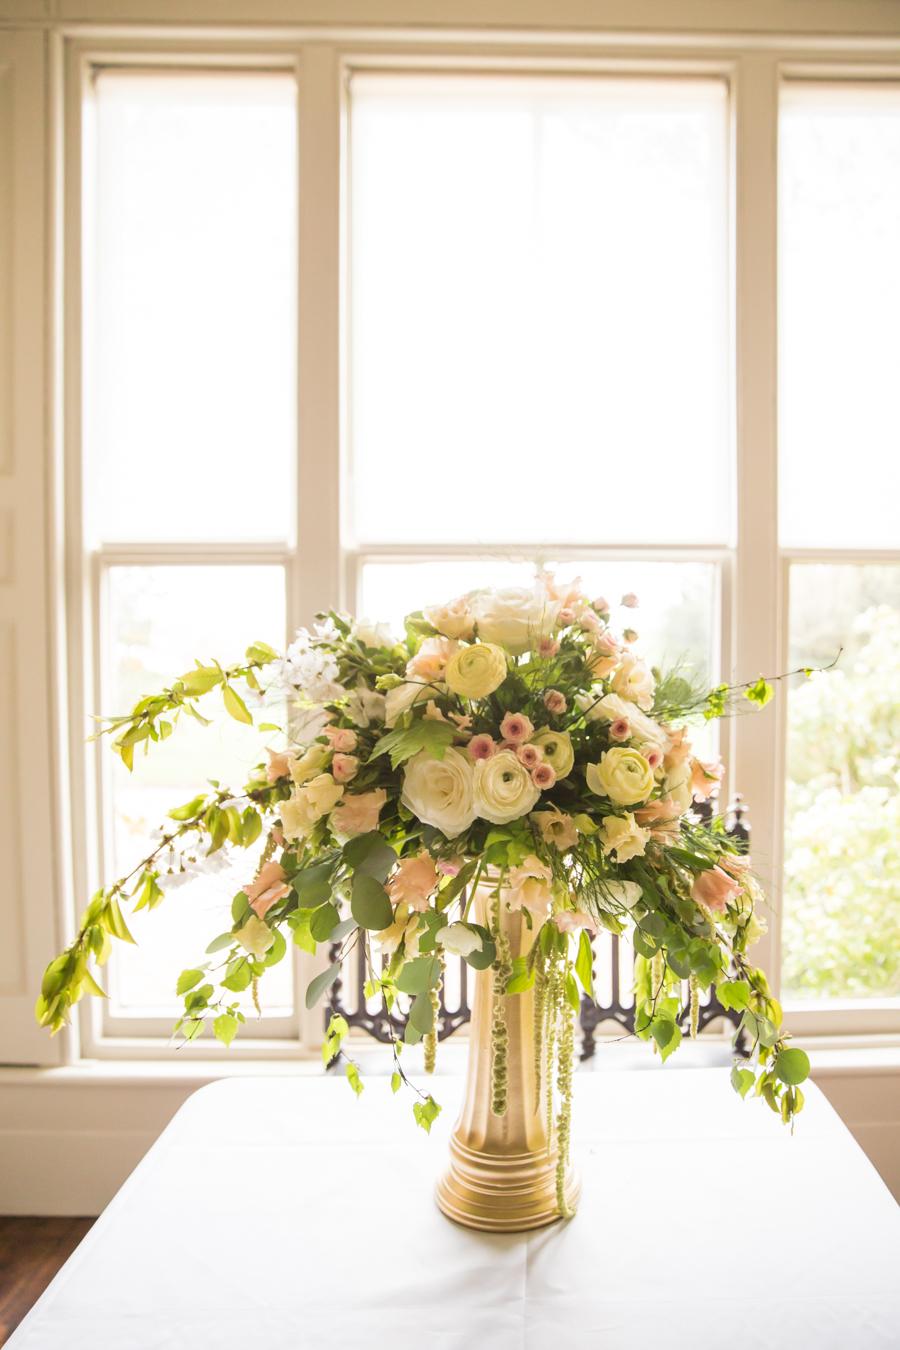 English country garden wedding style ideas with Hannah Larkin Photography (9)